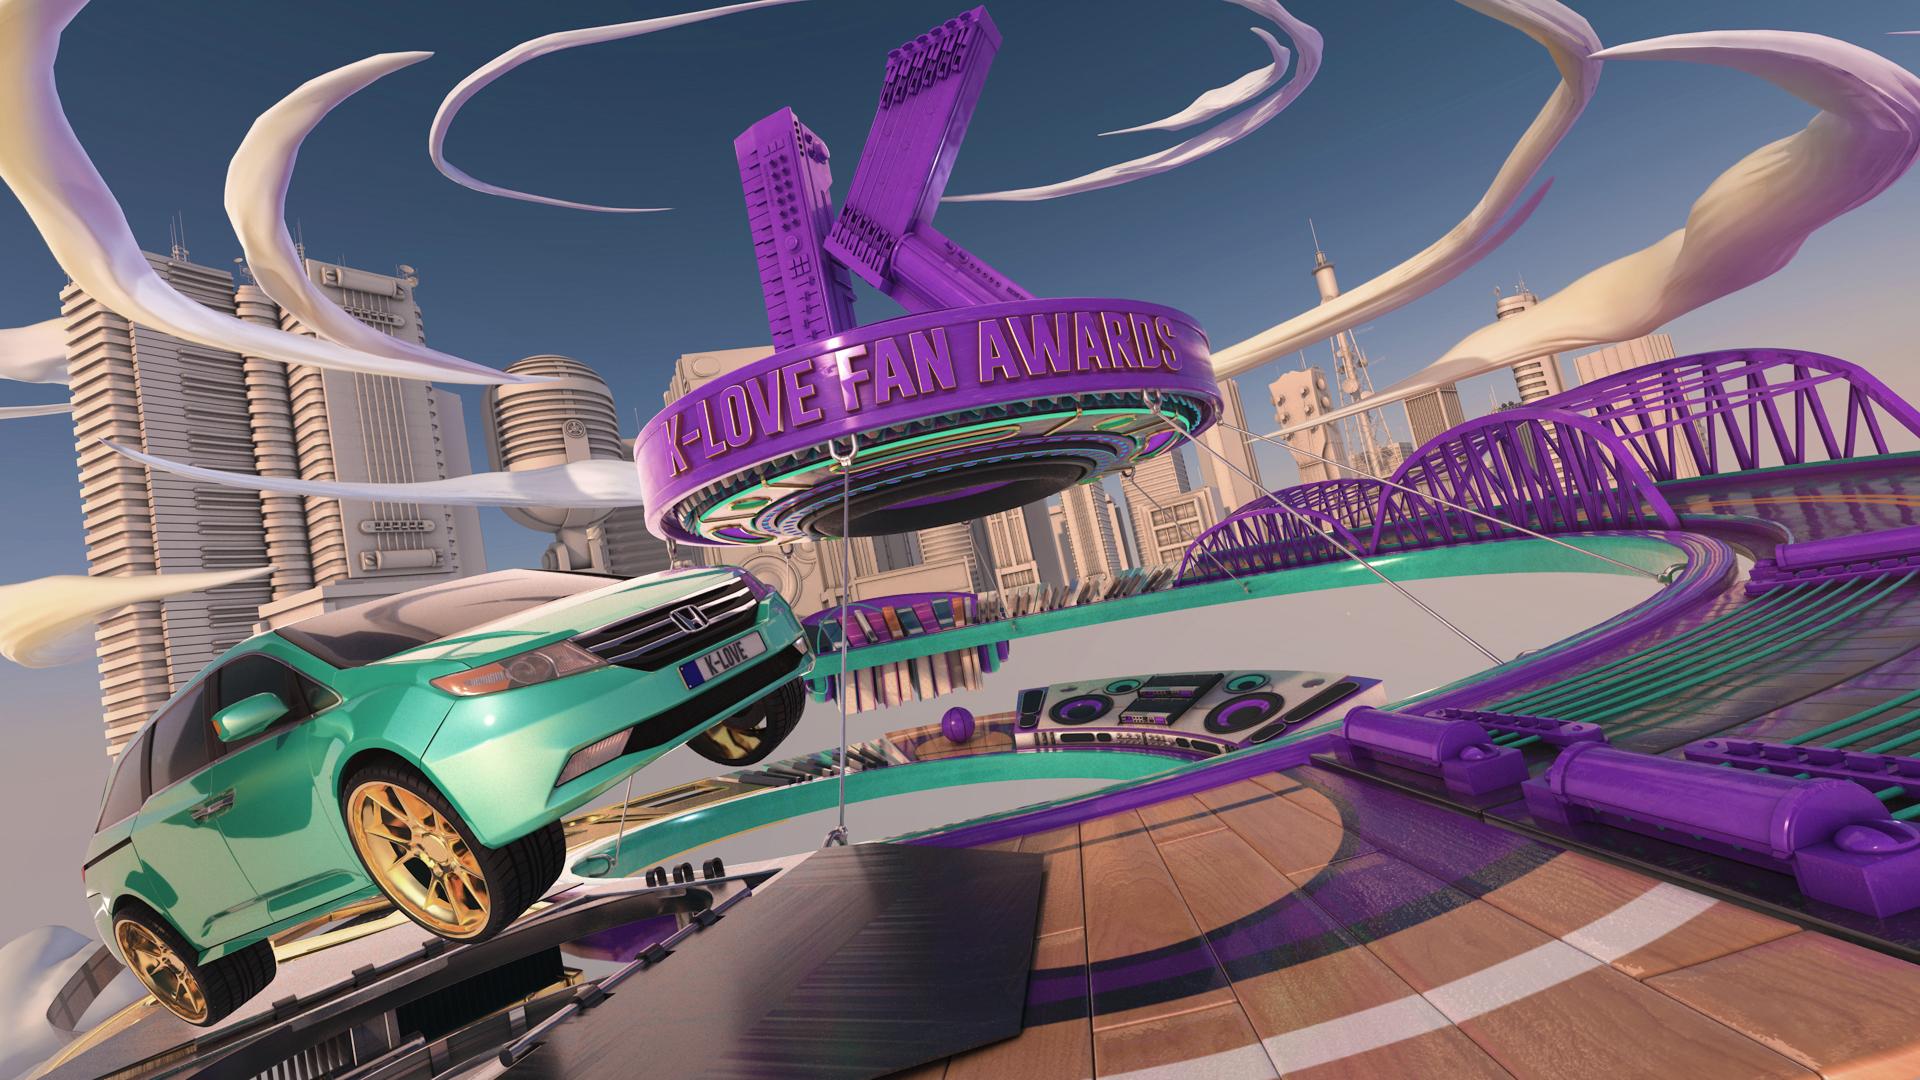 Fan Awards Mini-Van